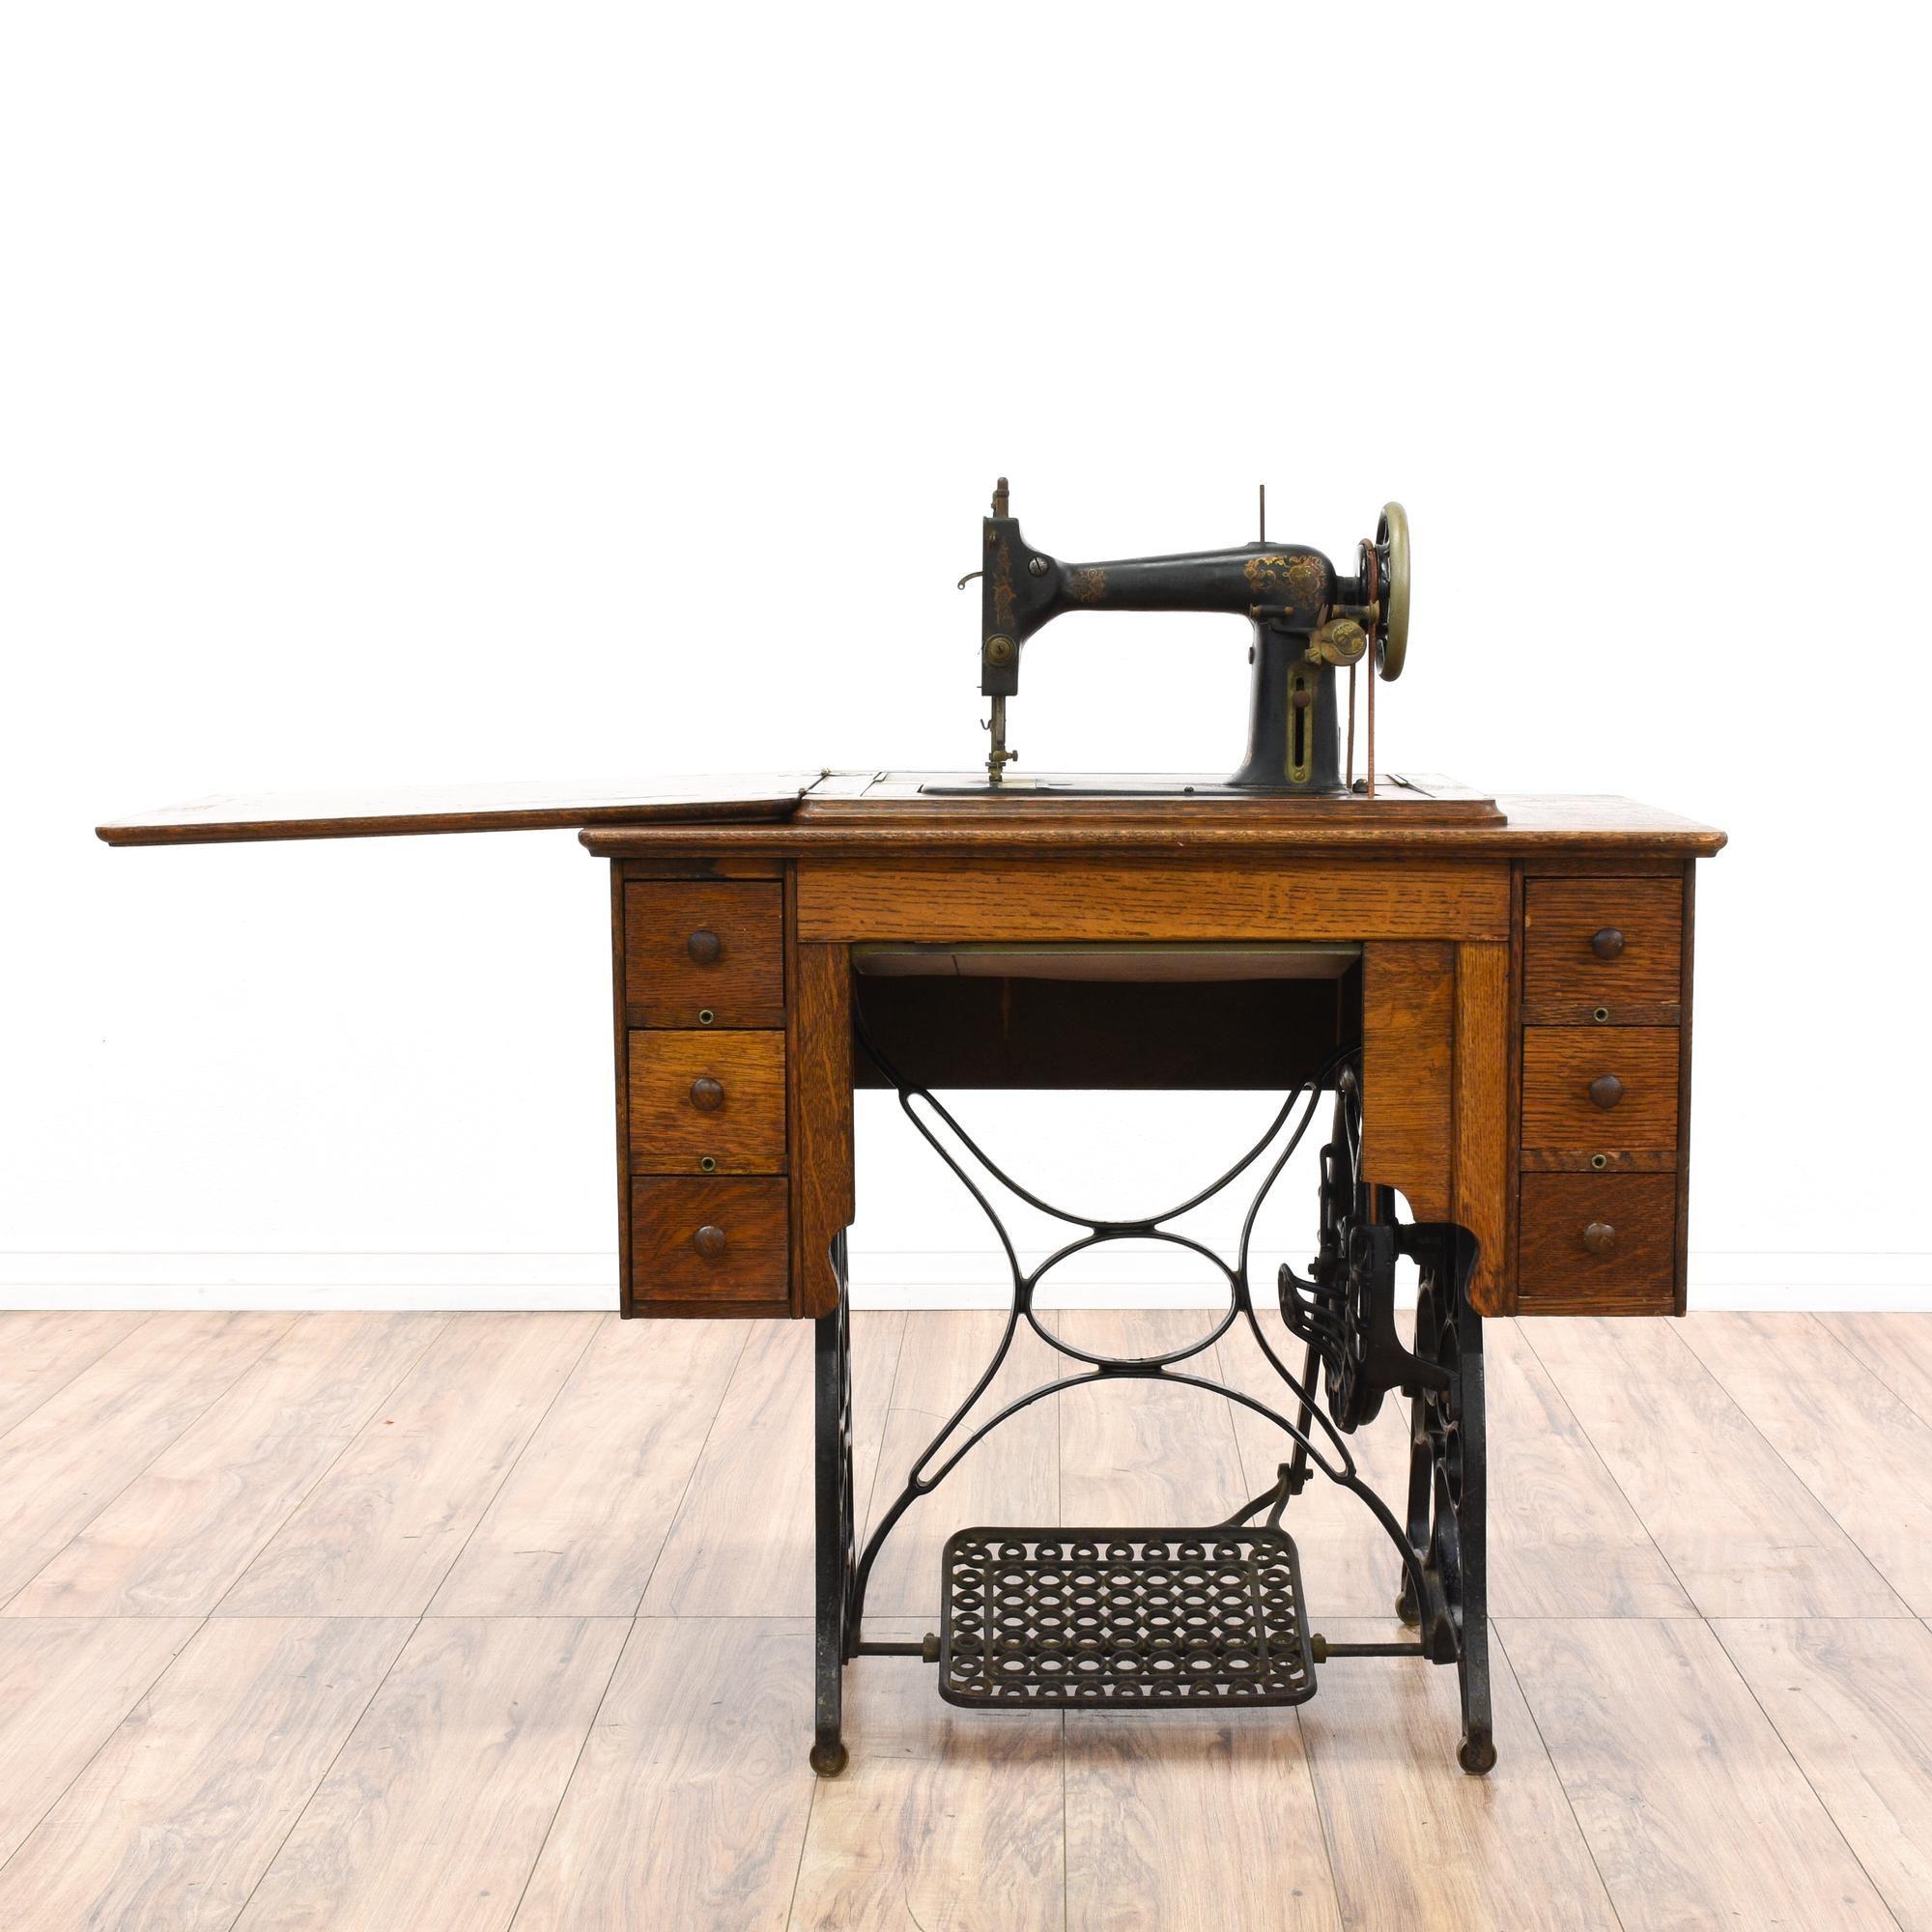 Working Treadle Sewing Machine Table | Loveseat Vintage Furniture San Diego  U0026 Los Angeles